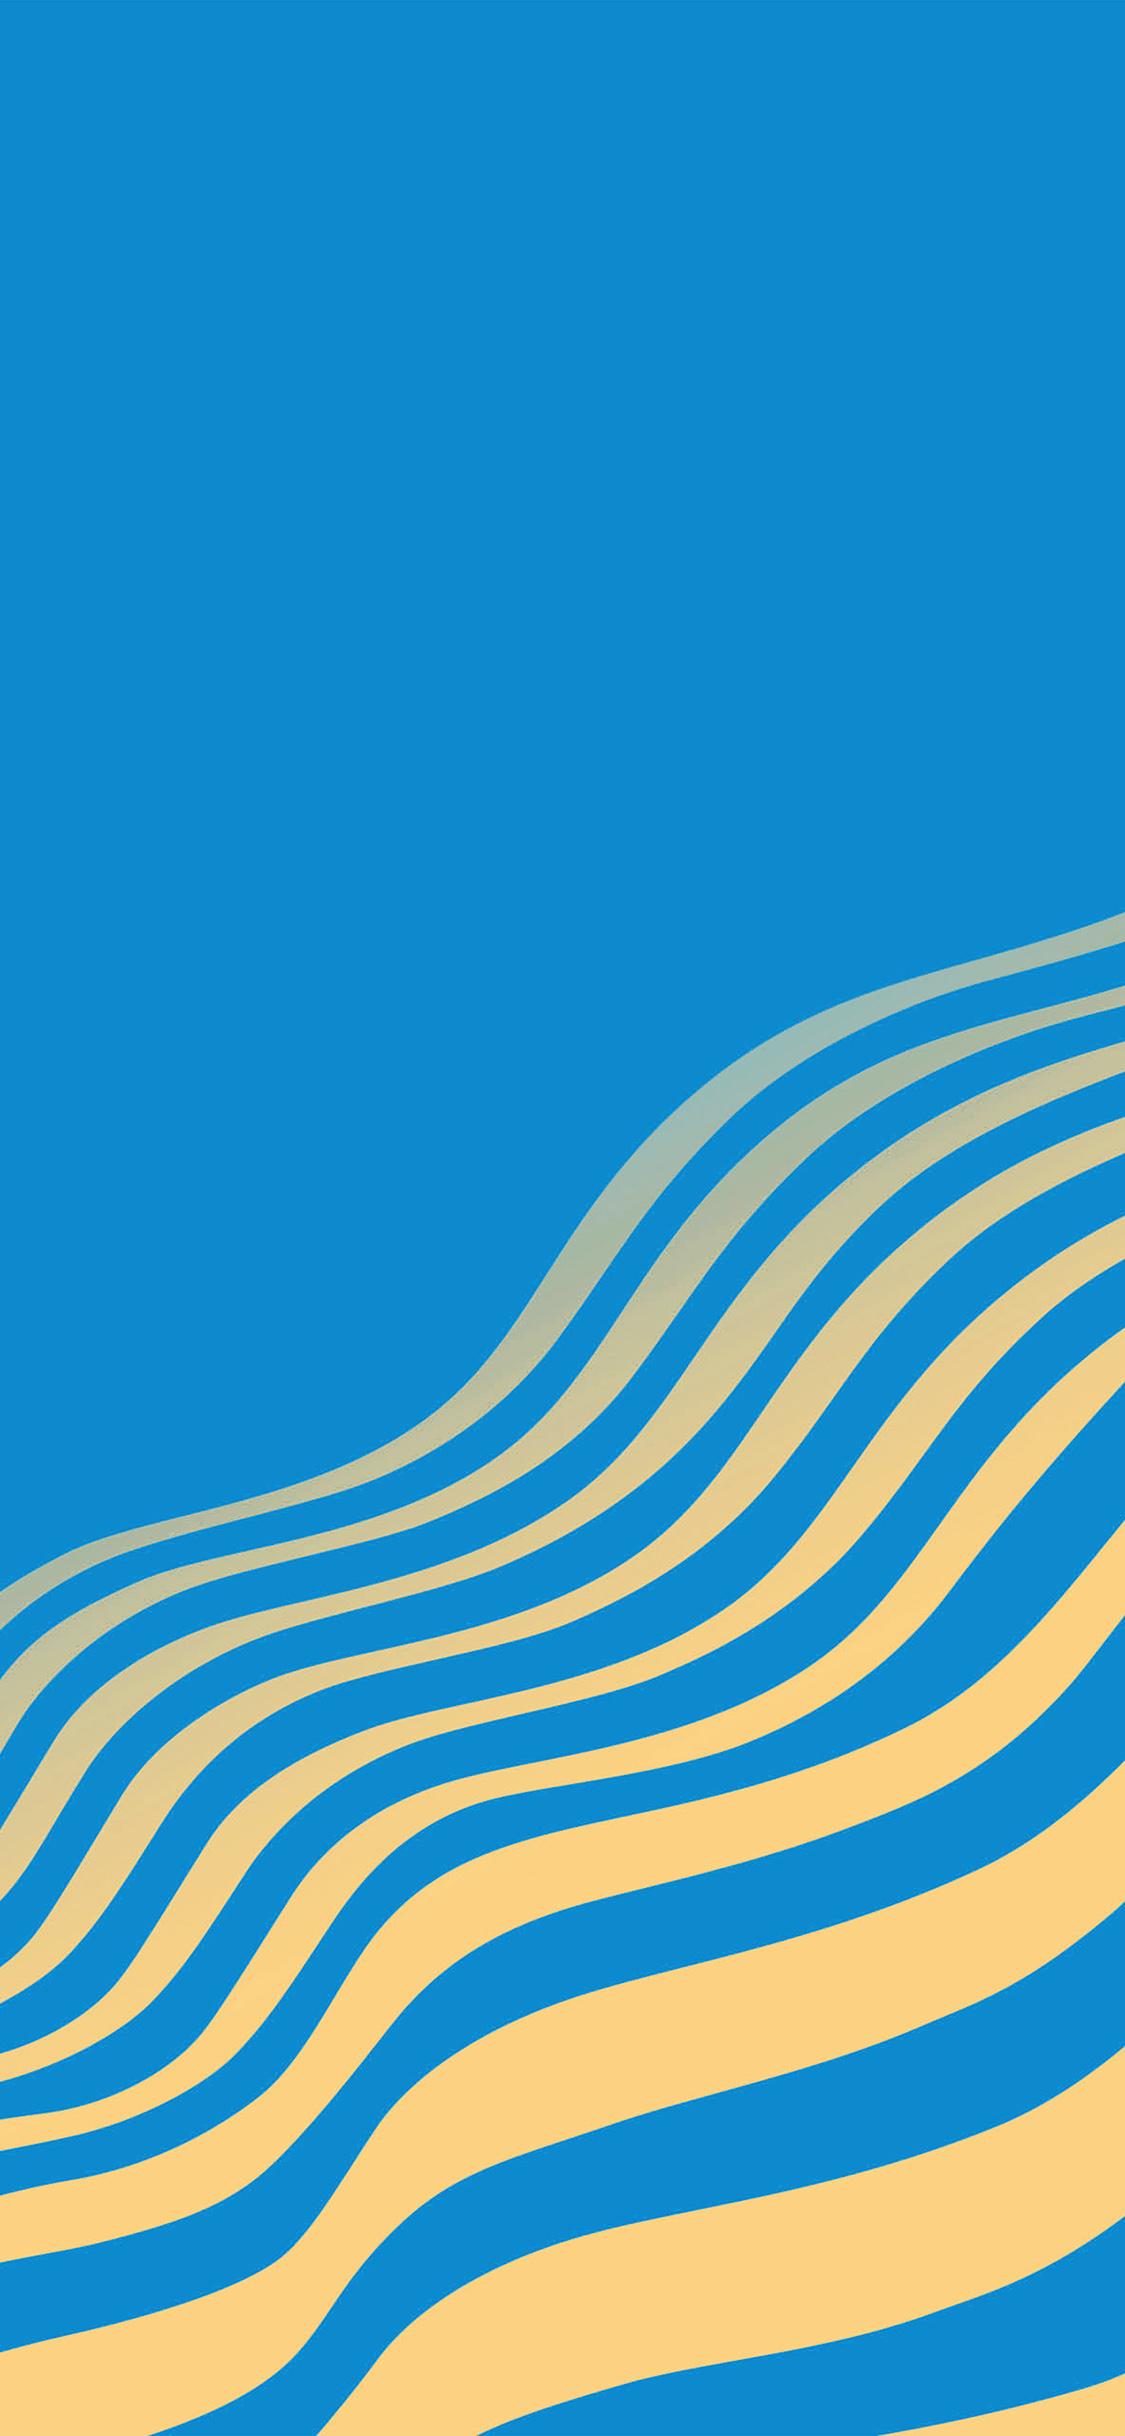 iPhonexpapers.com-Apple-iPhone-wallpaper-vu23-line-simple-minimal-curve-pattern-blue